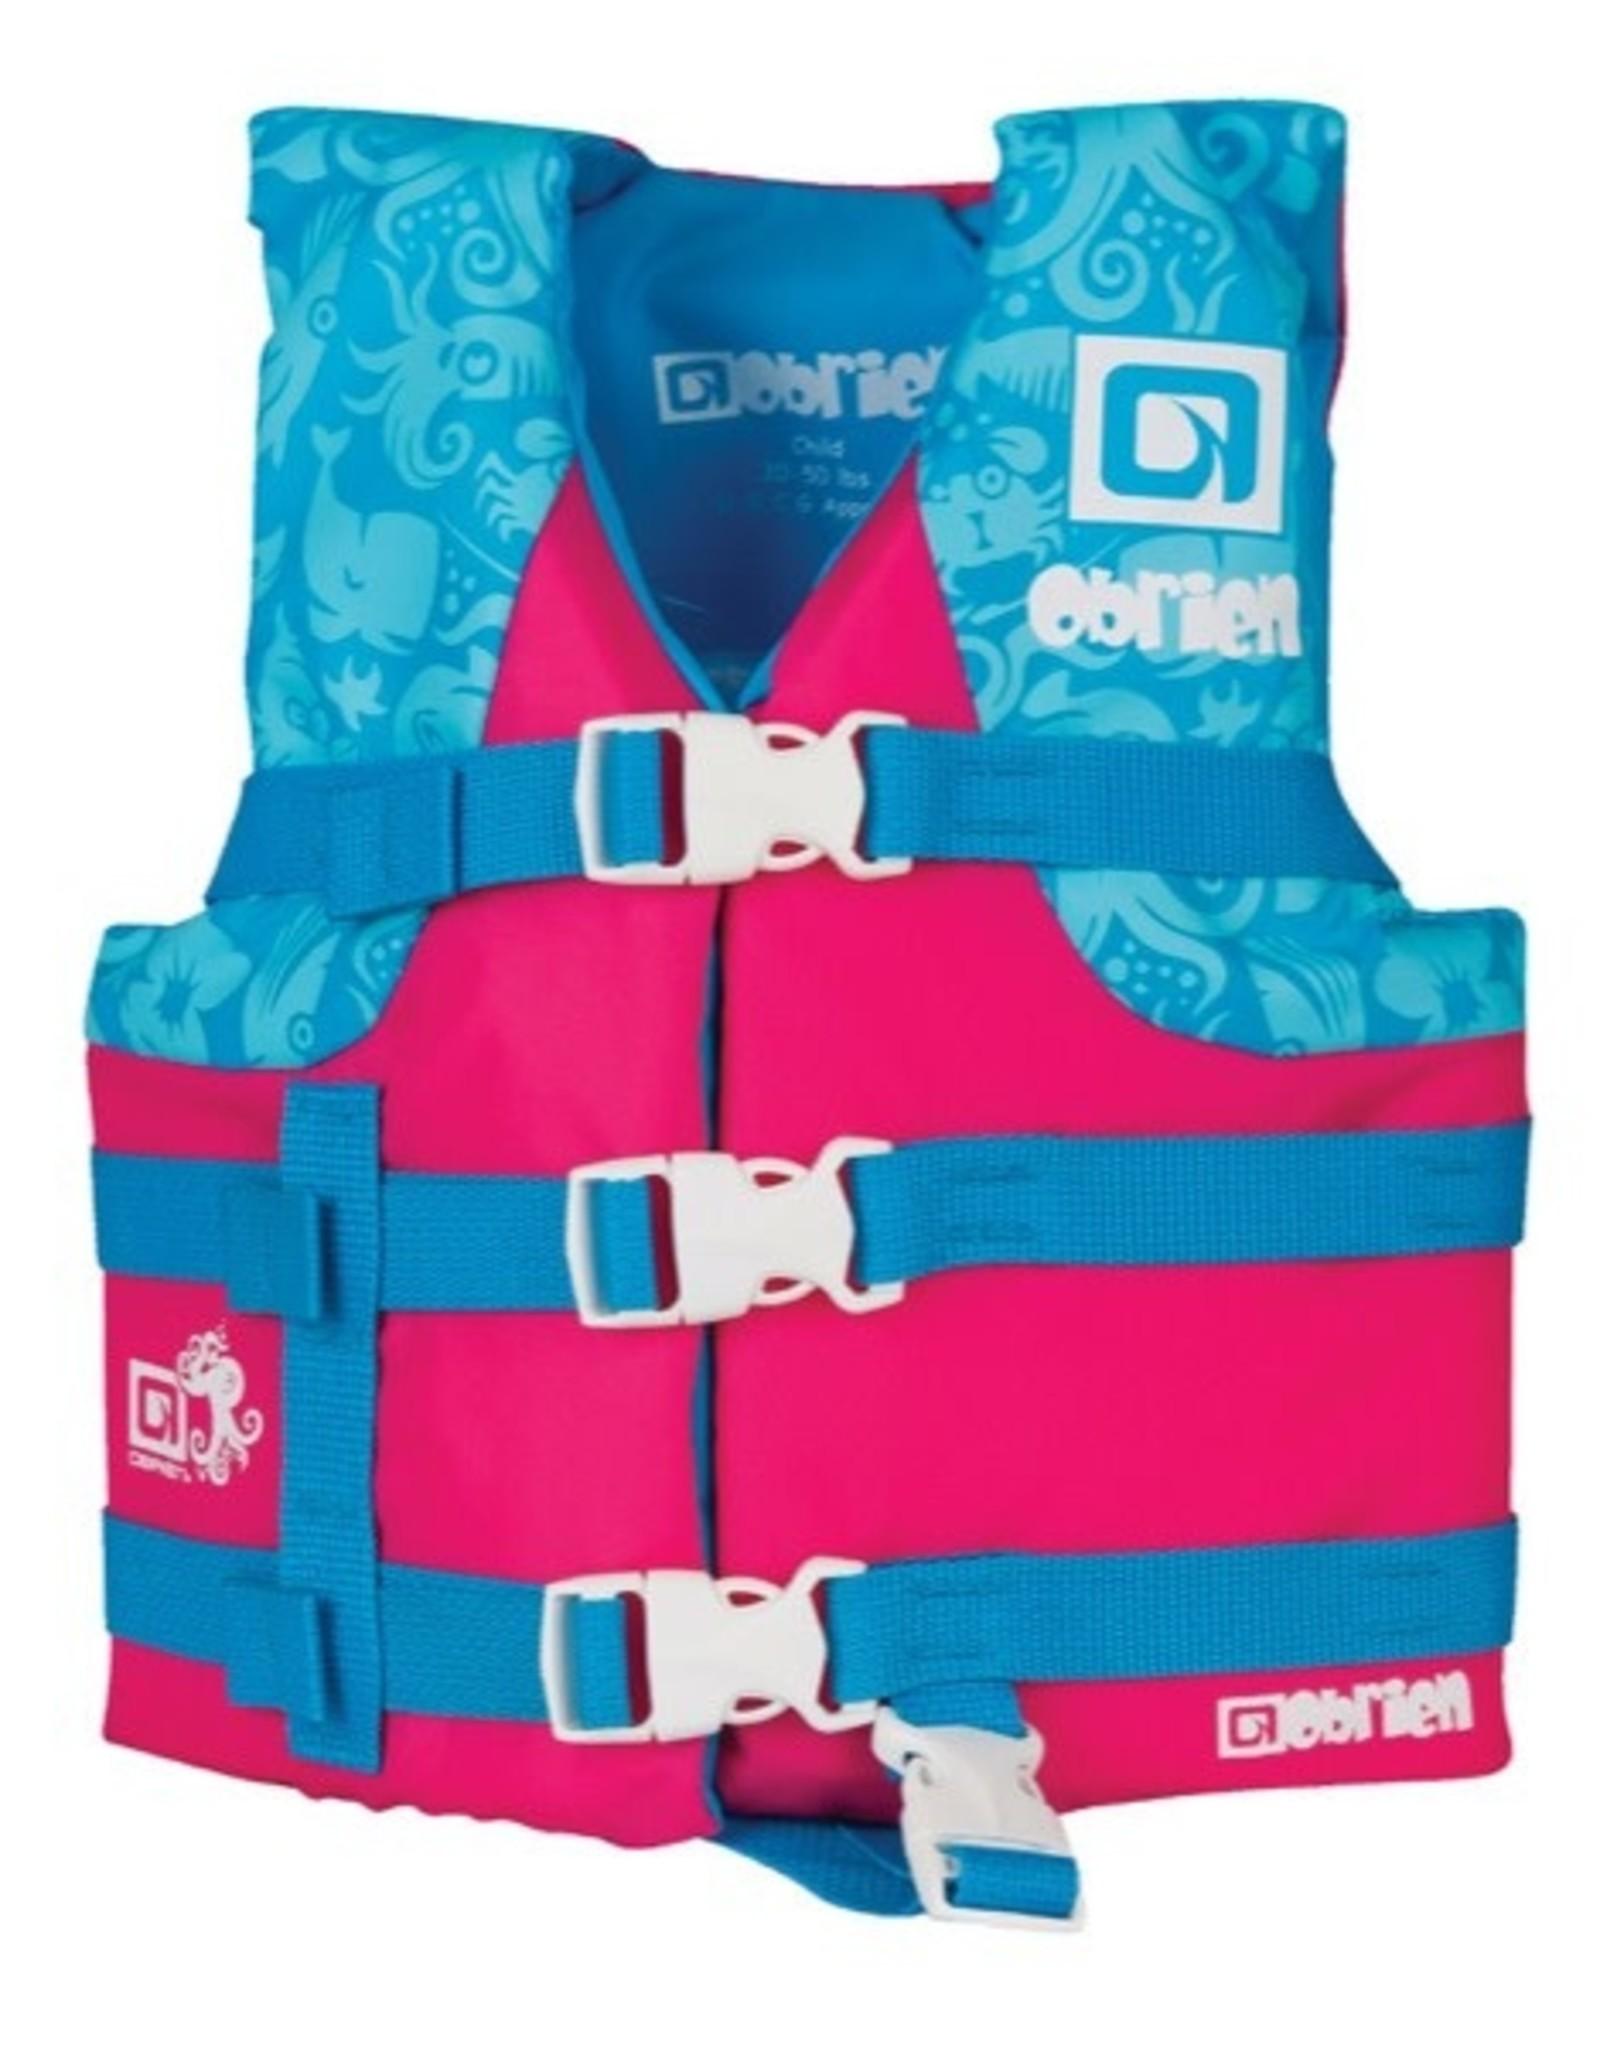 O'Brien Girls Child Nylon, Pink-(30-50 lbs)